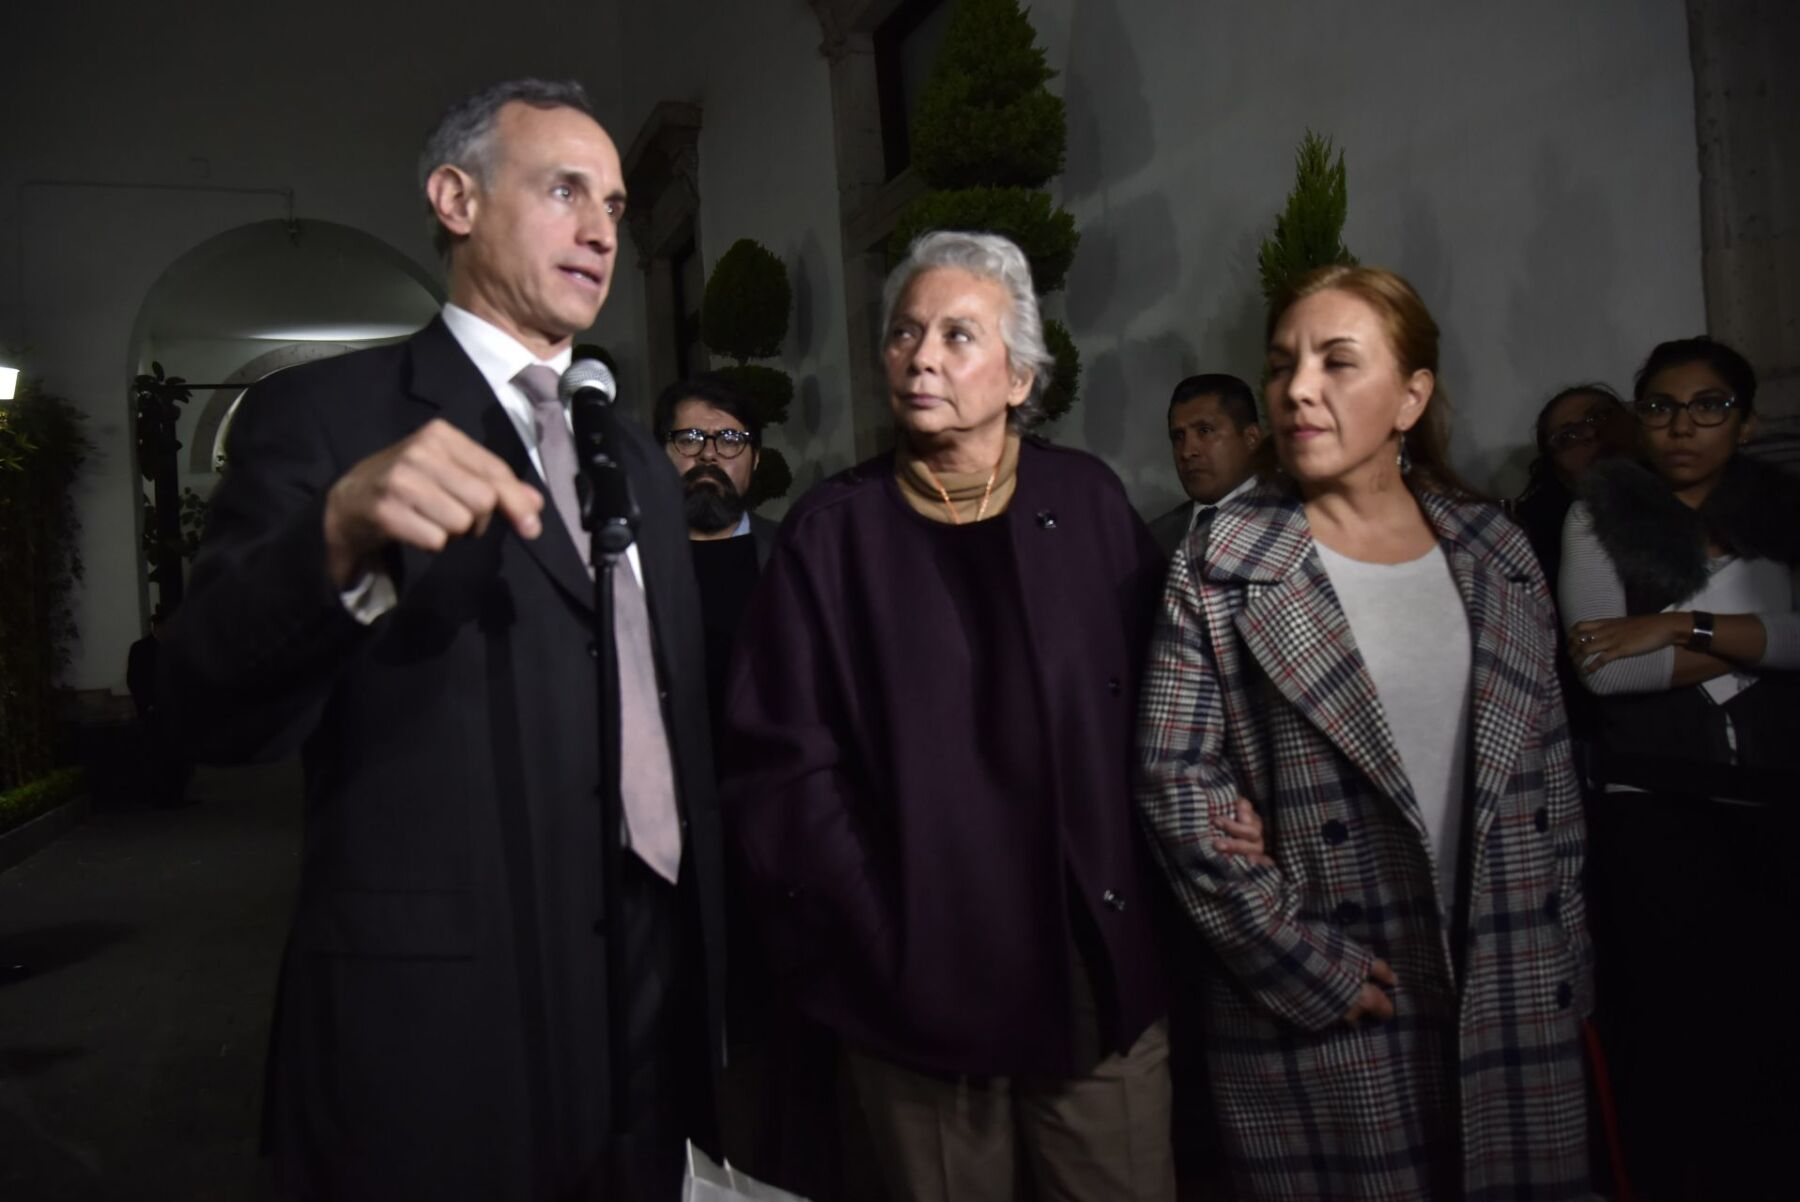 Hugo López-Gatell y Olga Sánchez